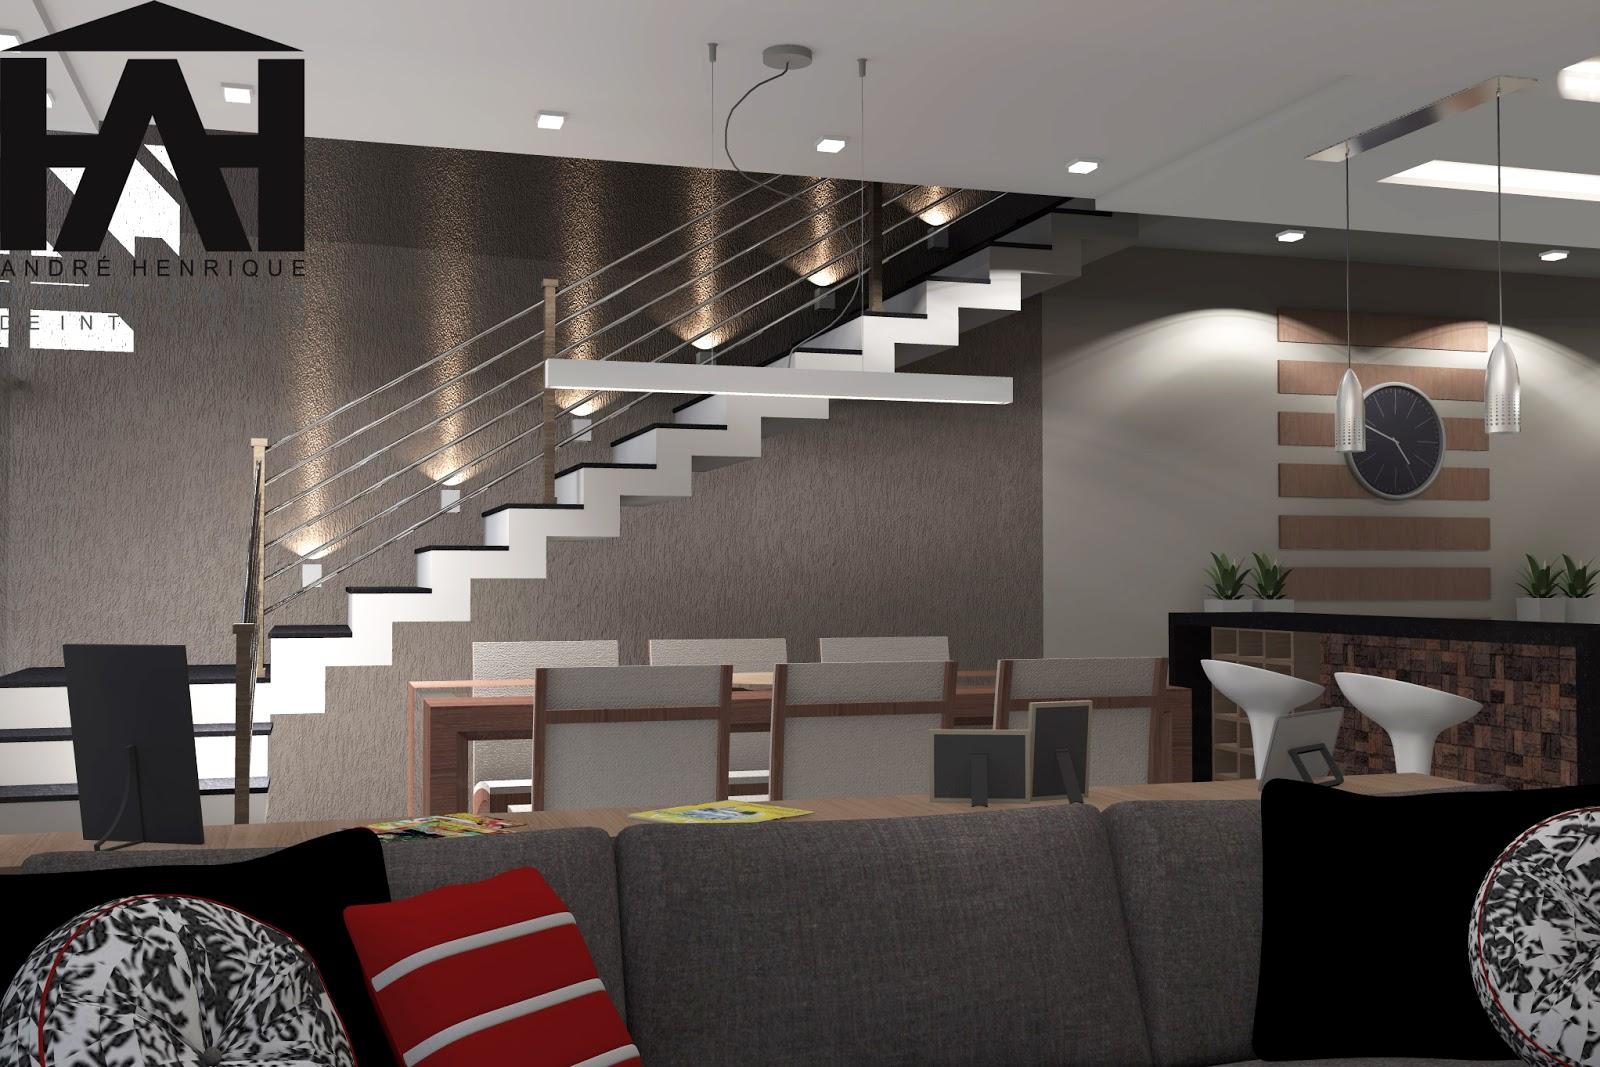 #5F3C38 Designer de Interiores : Projeto Residencial ! sala cozinha e sala  1600x1067 px Projeto Cozinha E Sala #2513 imagens